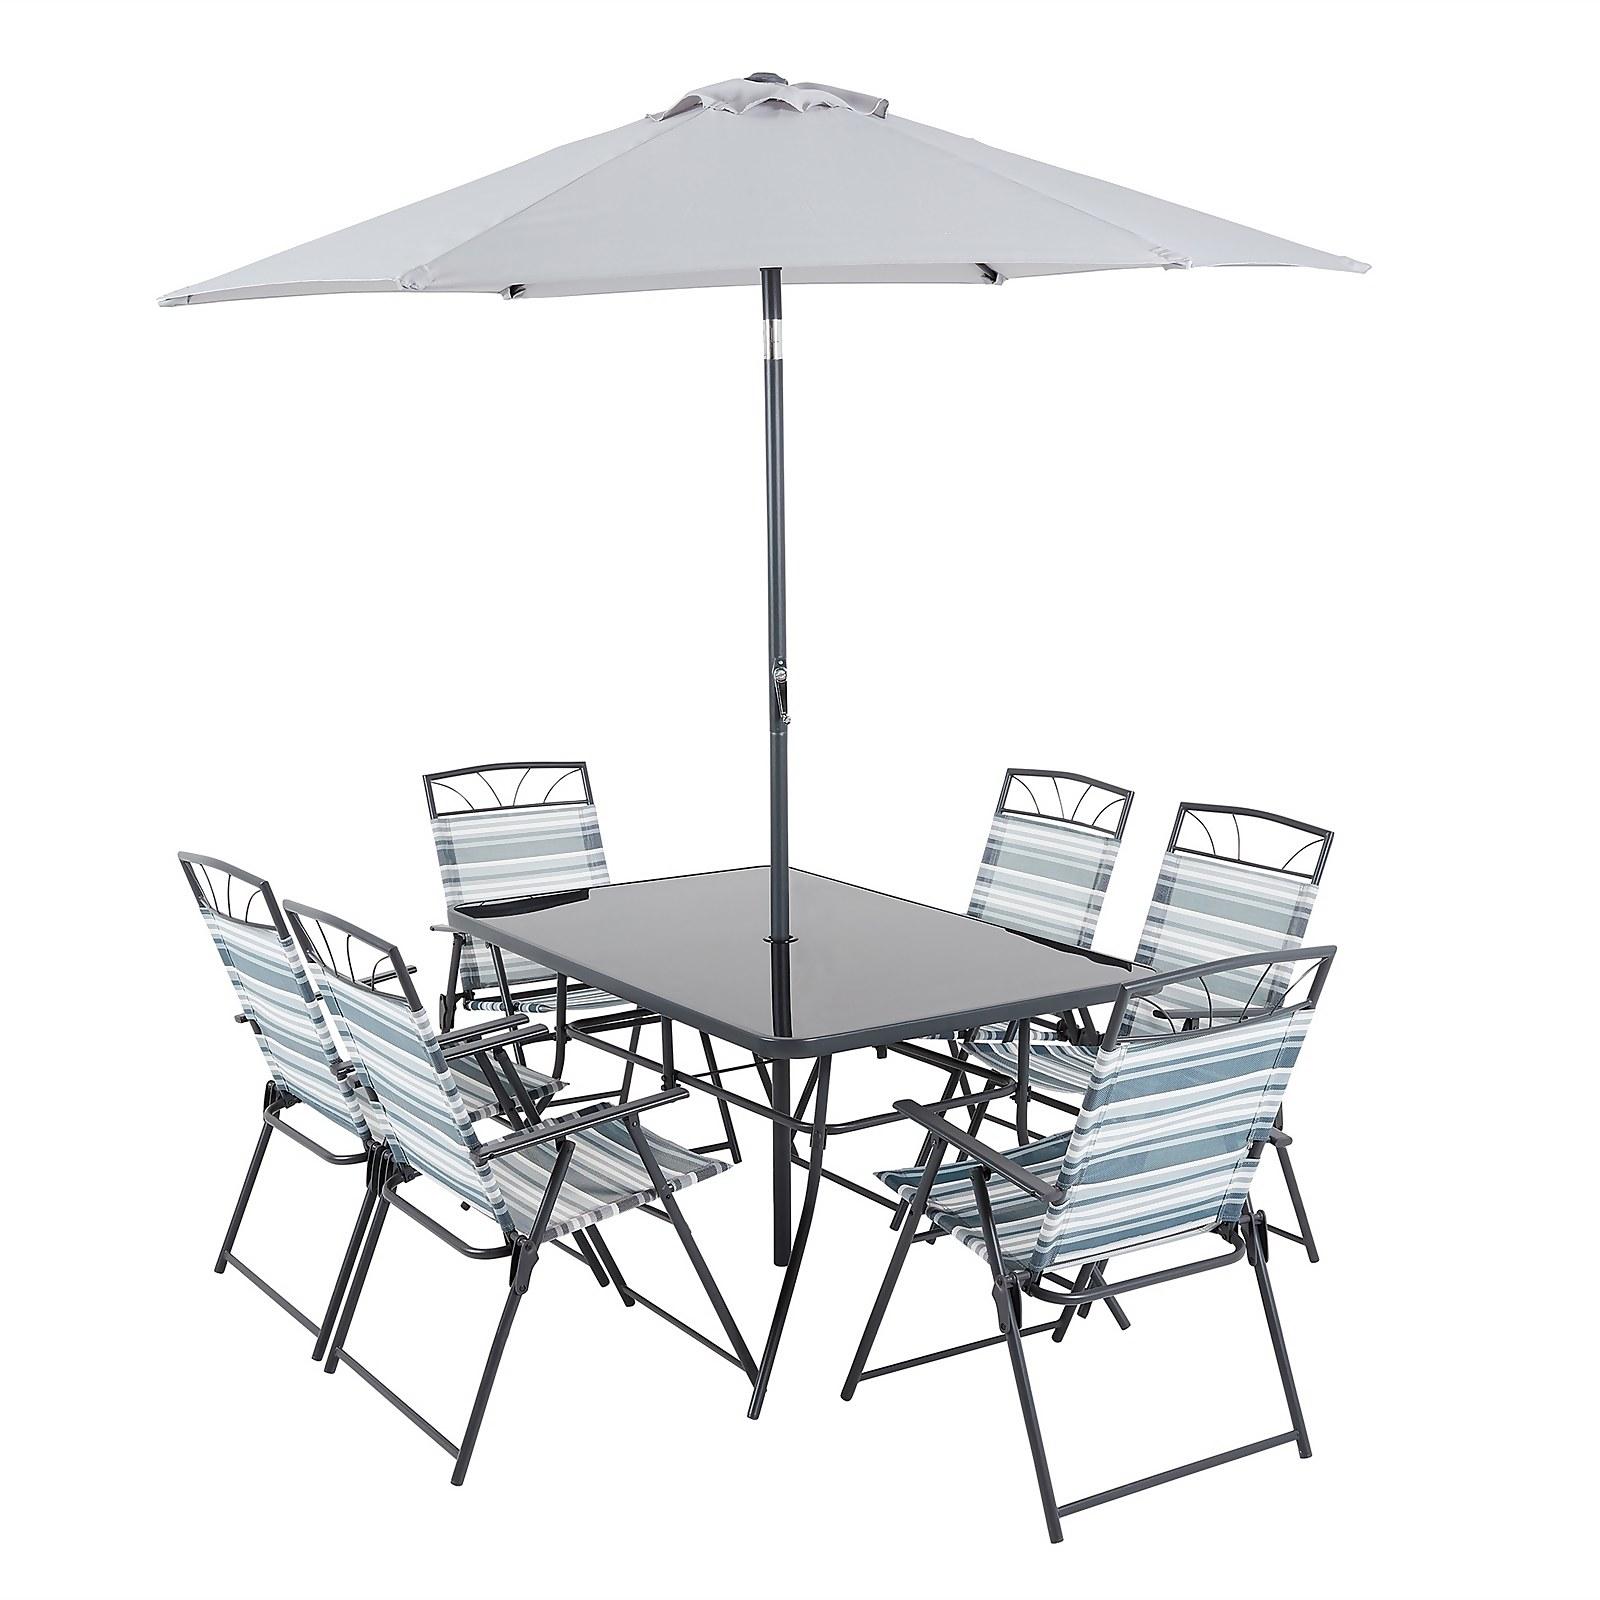 Wexfordly 6 Seater Metal Garden Furniture Dining Set